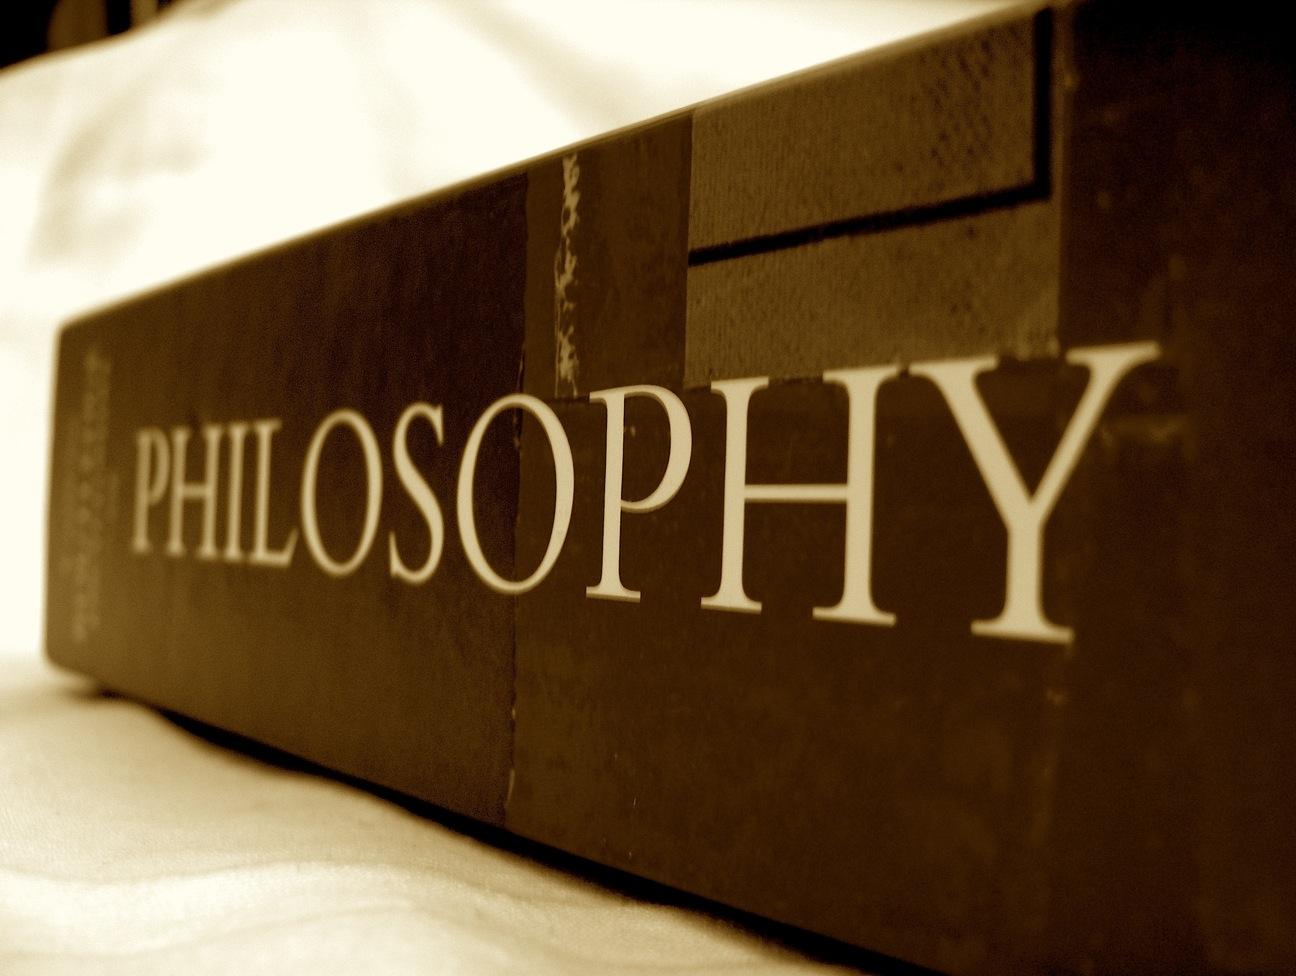 Kumpulan Kata Kata Bijak 10 Filsuf Terkenal